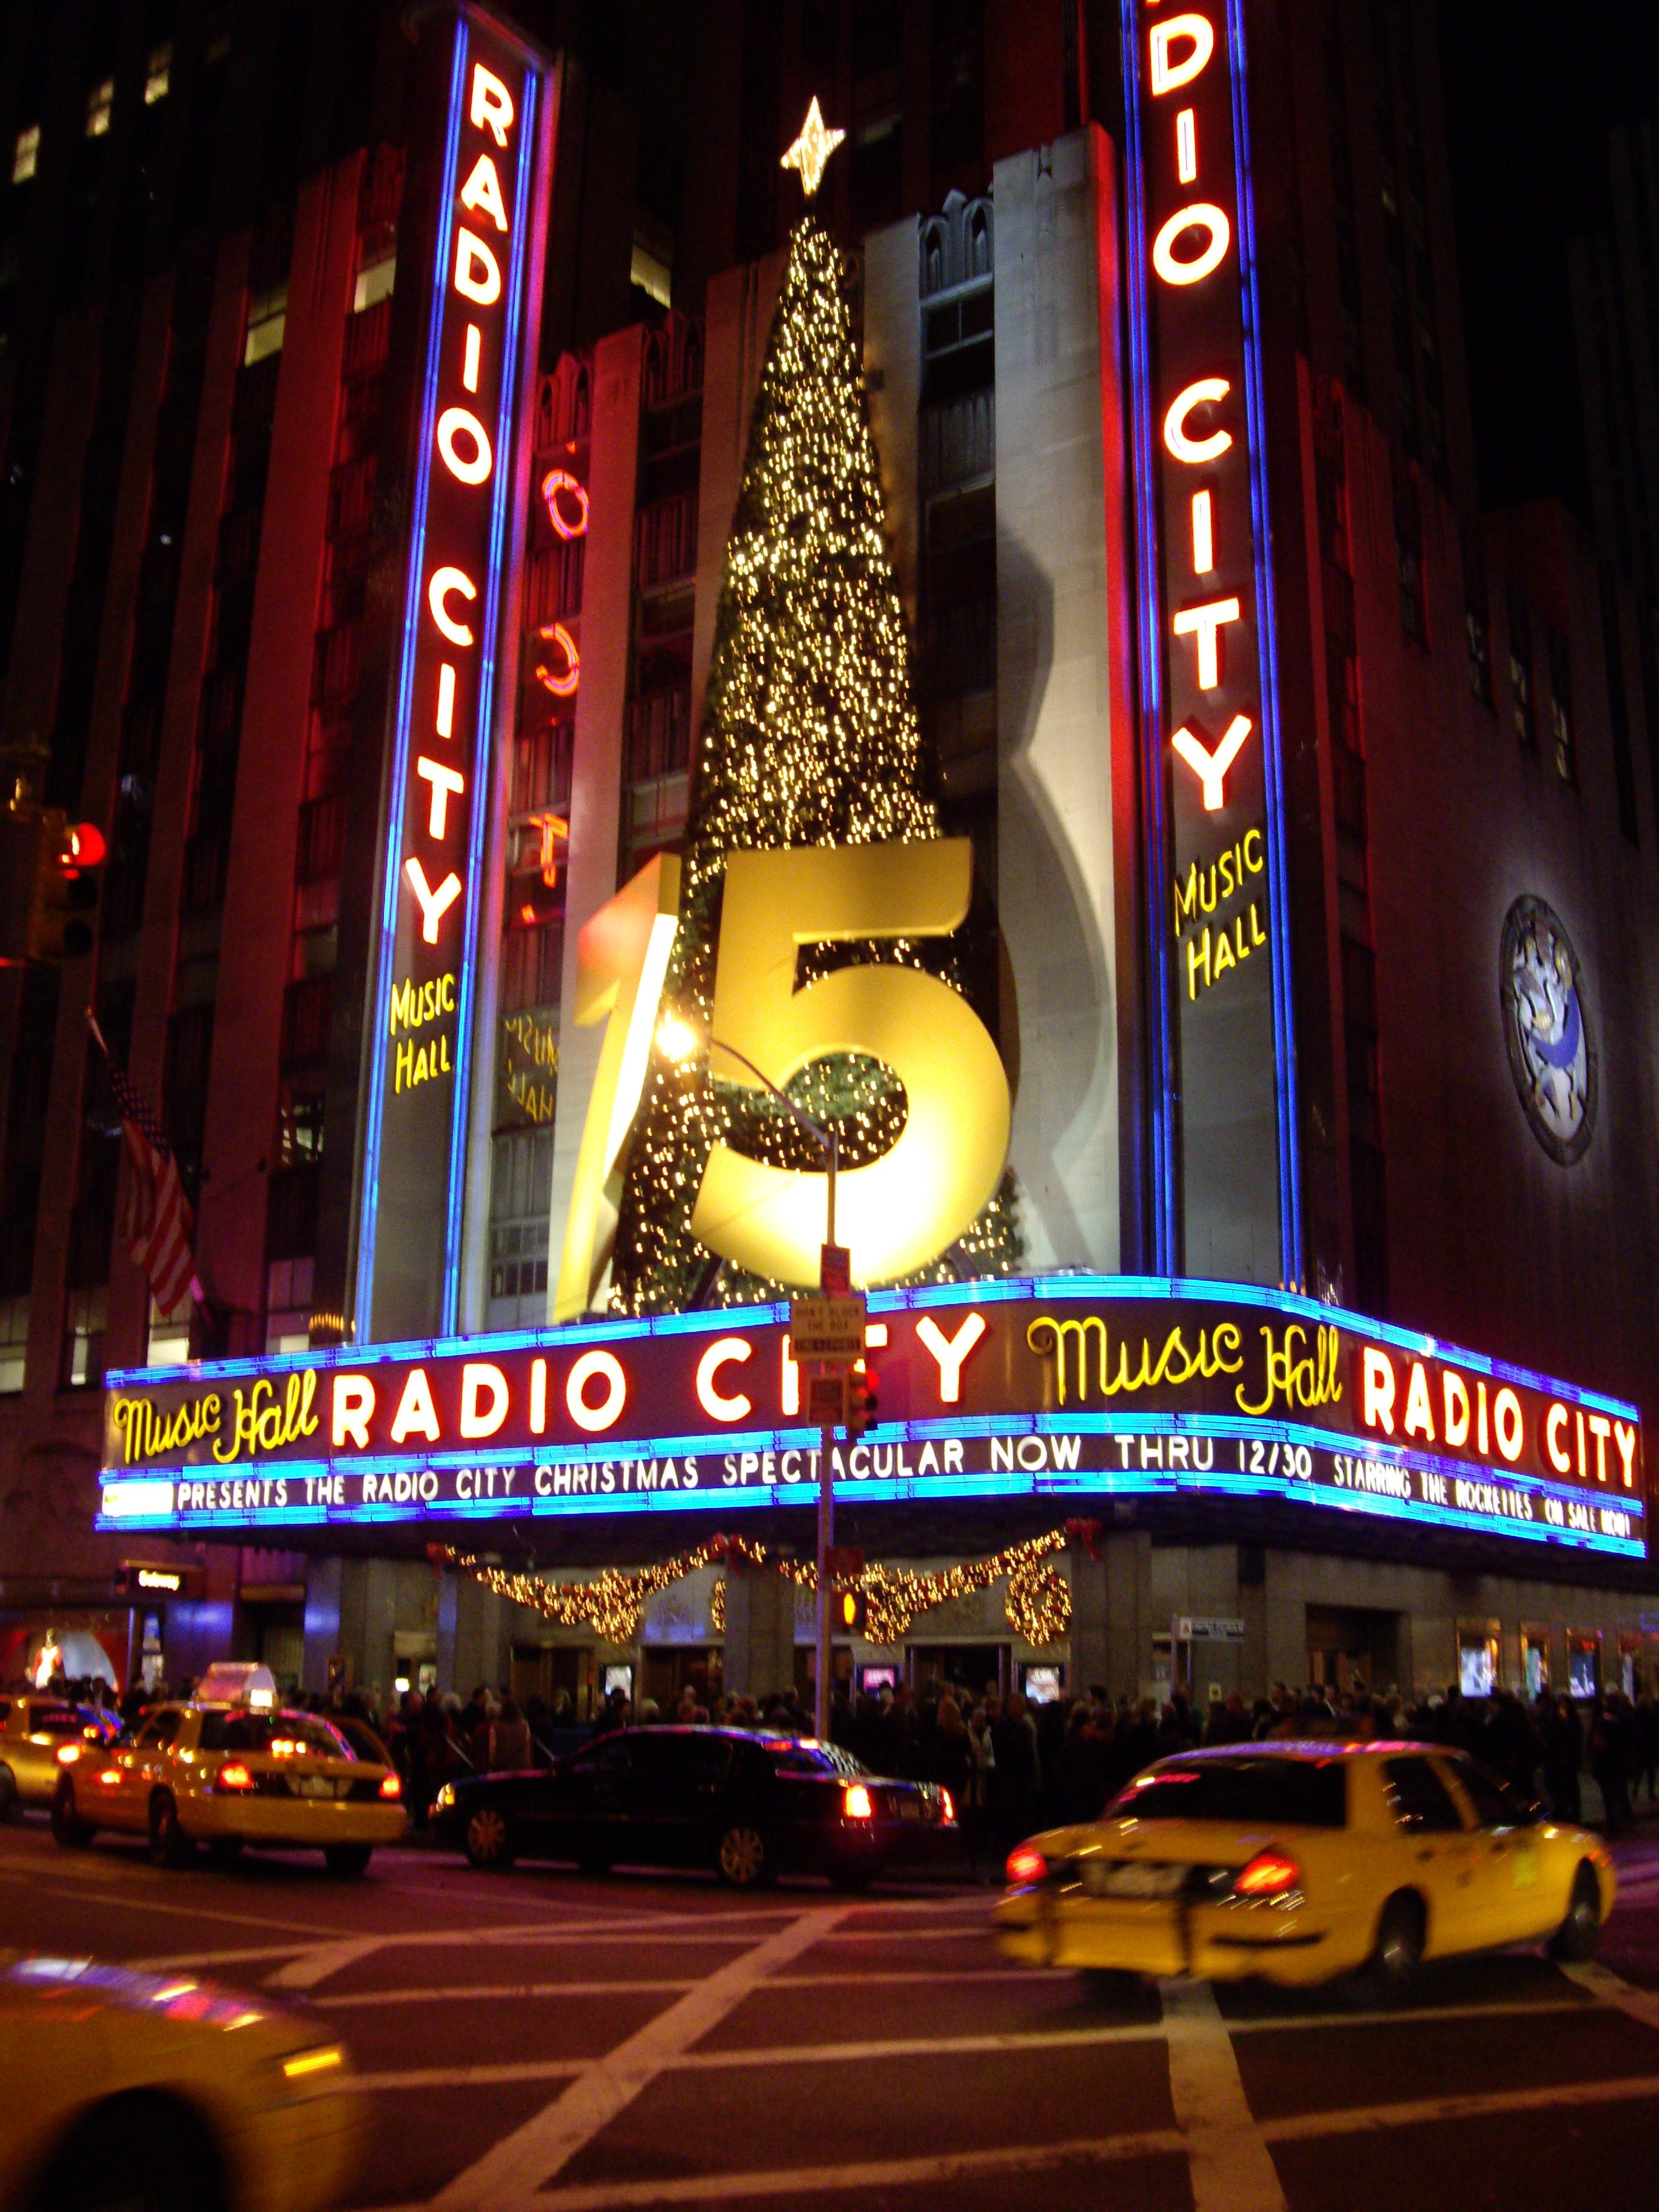 Description radio city music hall